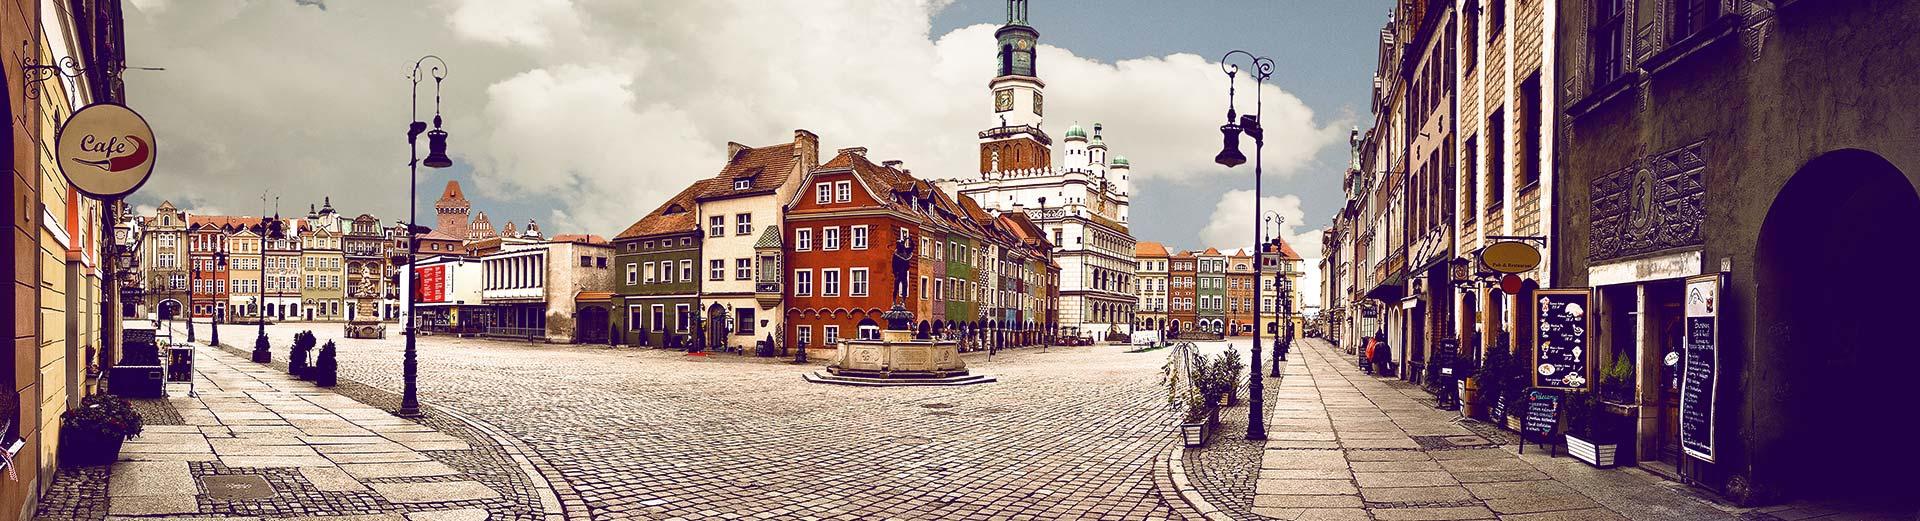 Targi mieszkaniowe Poznań